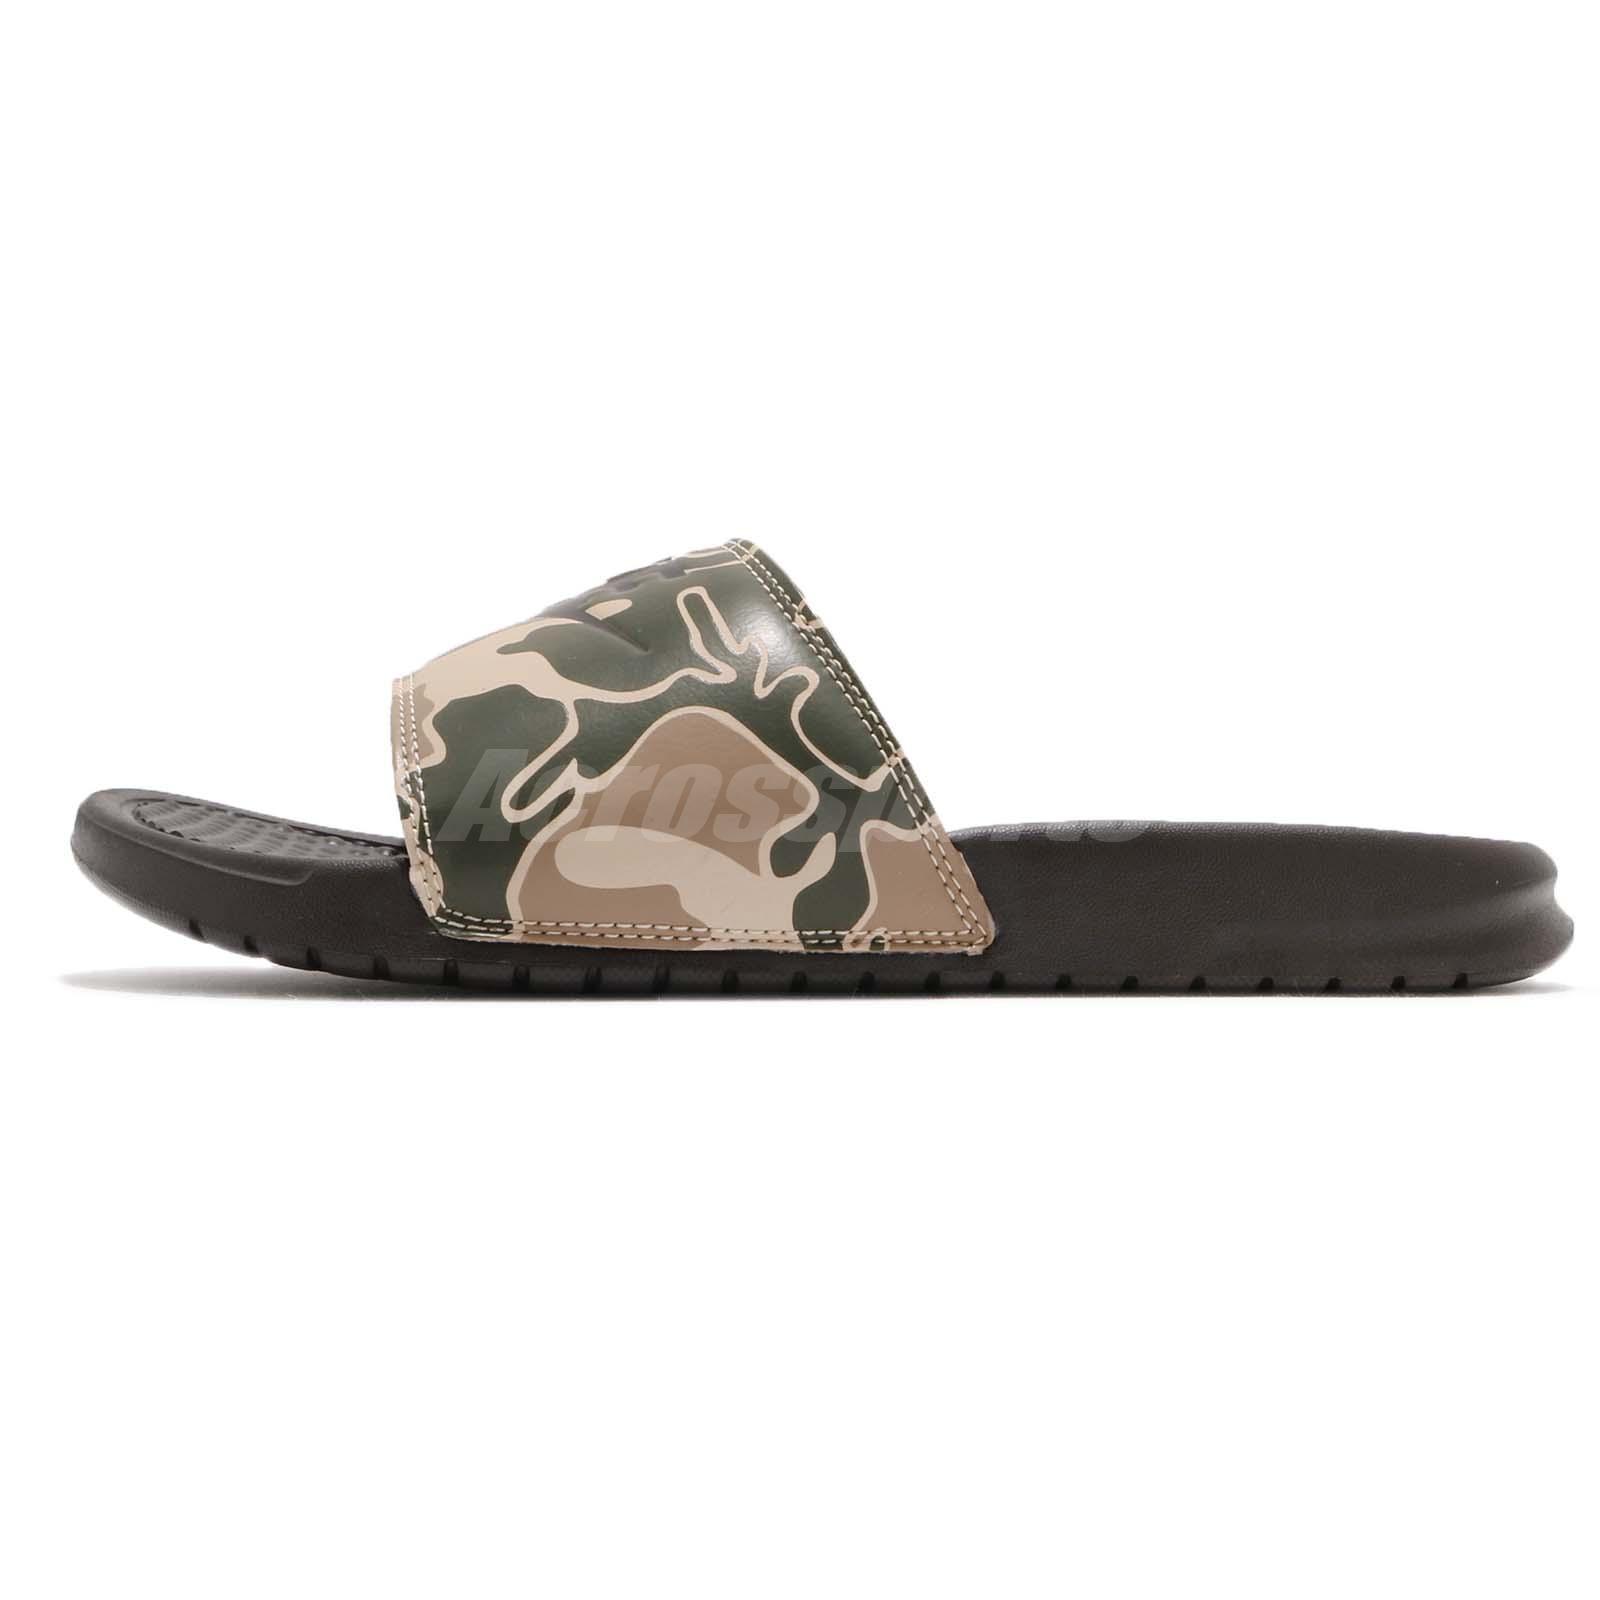 410d7f59c403 Nike Benassi JDI Print Velvet Brown Green Camo Men Sports Sandals ...